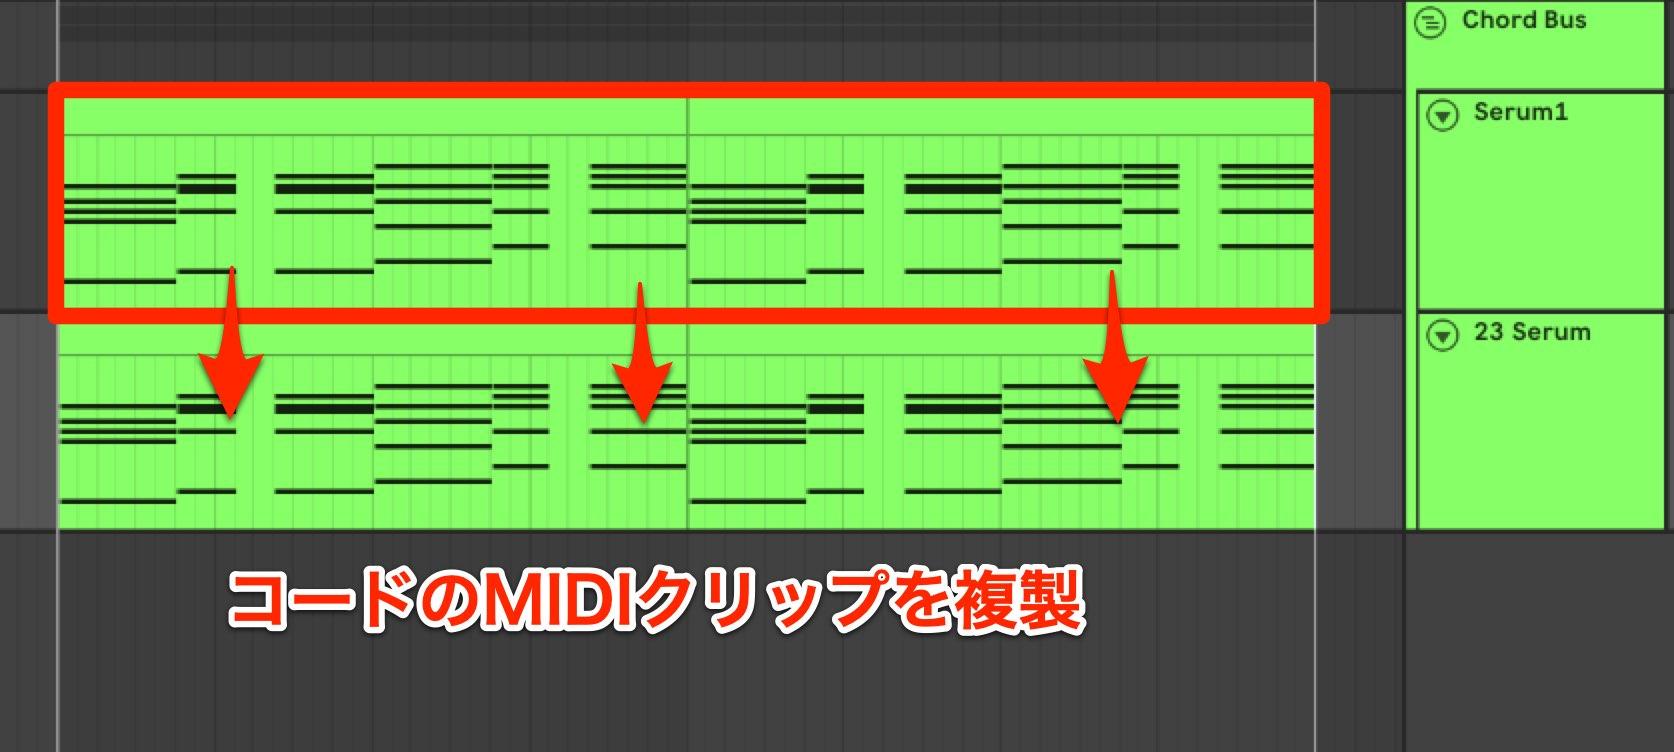 Future Bass コード 複製